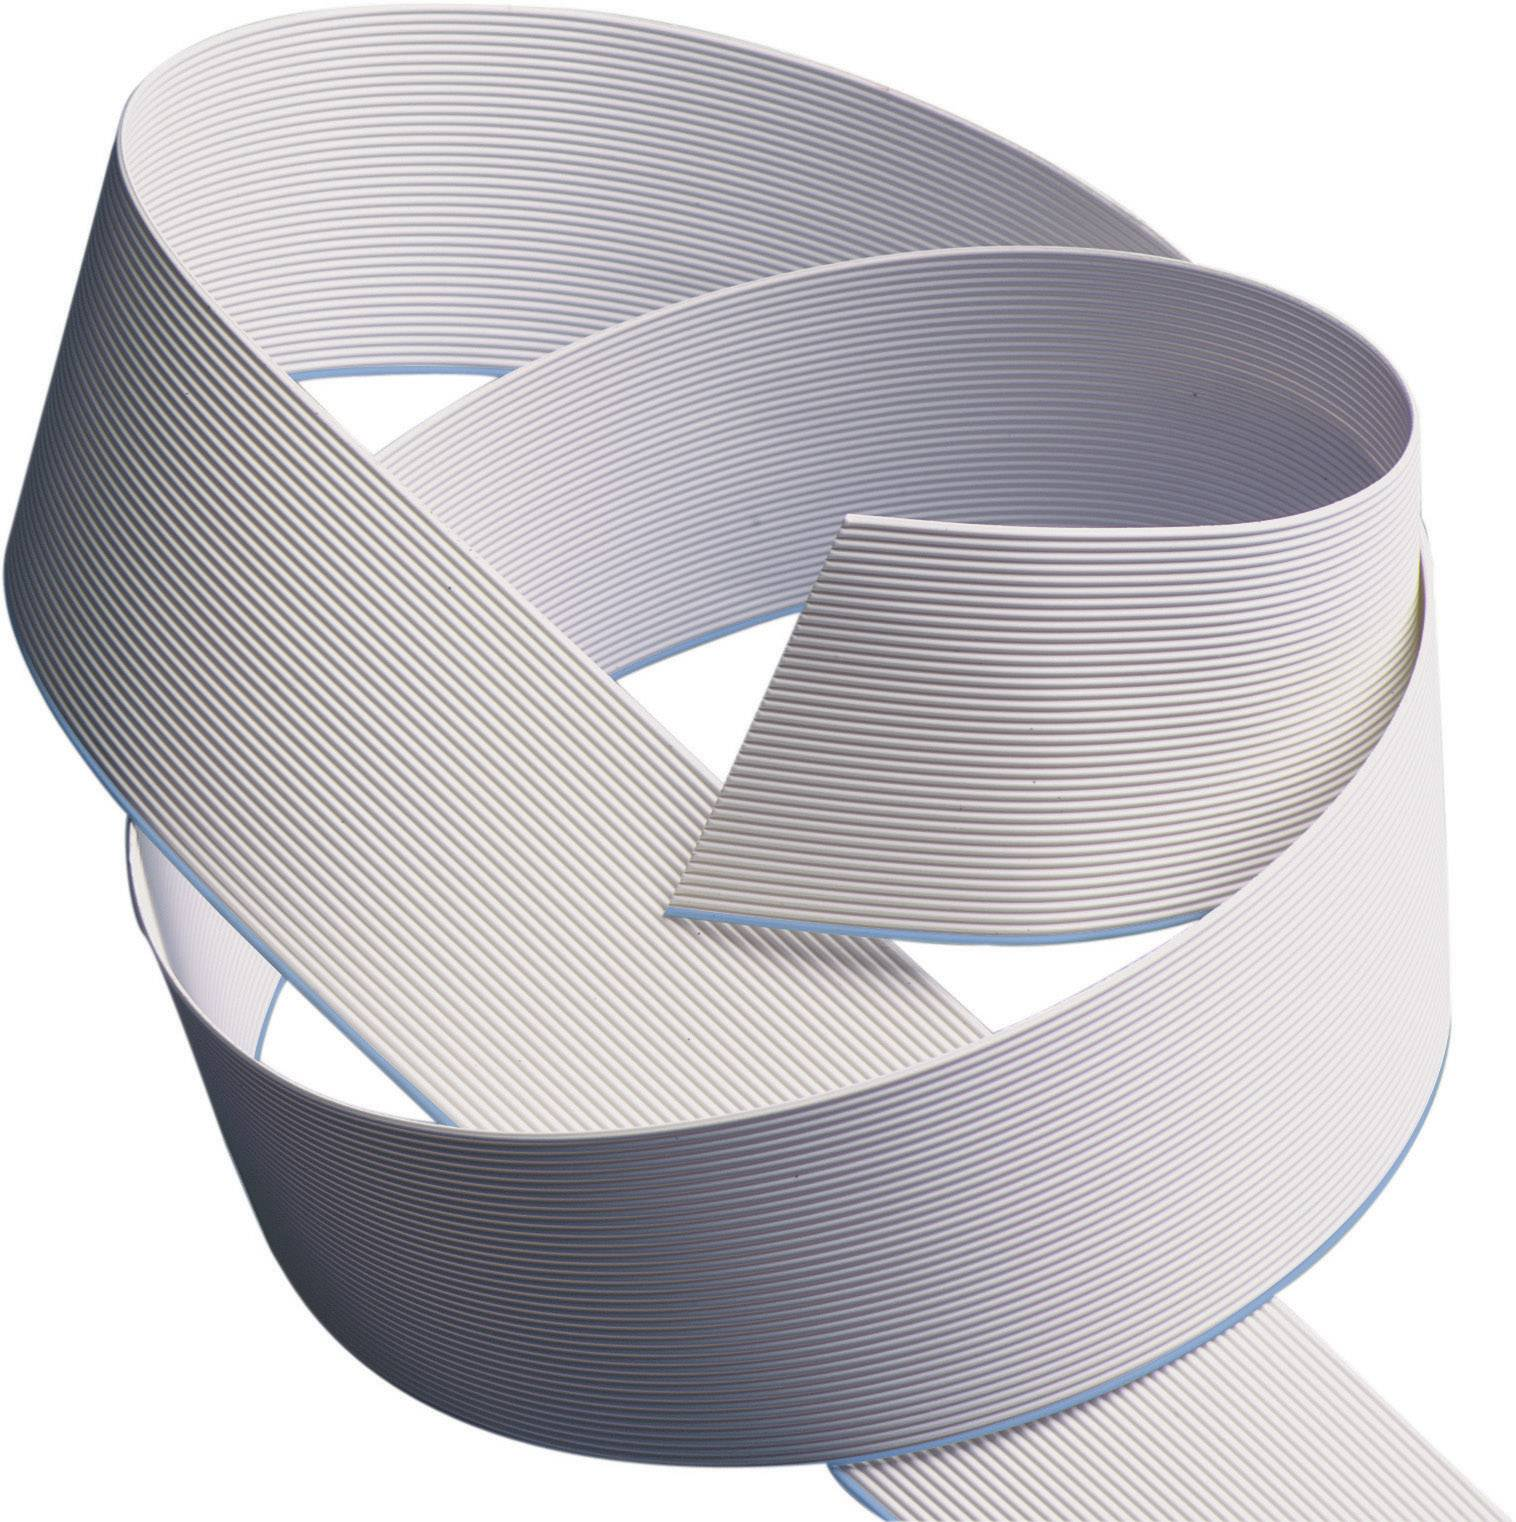 Plochý kábel 3M 7000057369, rozteč 1.27 mm, 26 x 0.08 mm², sivá, metrový tovar